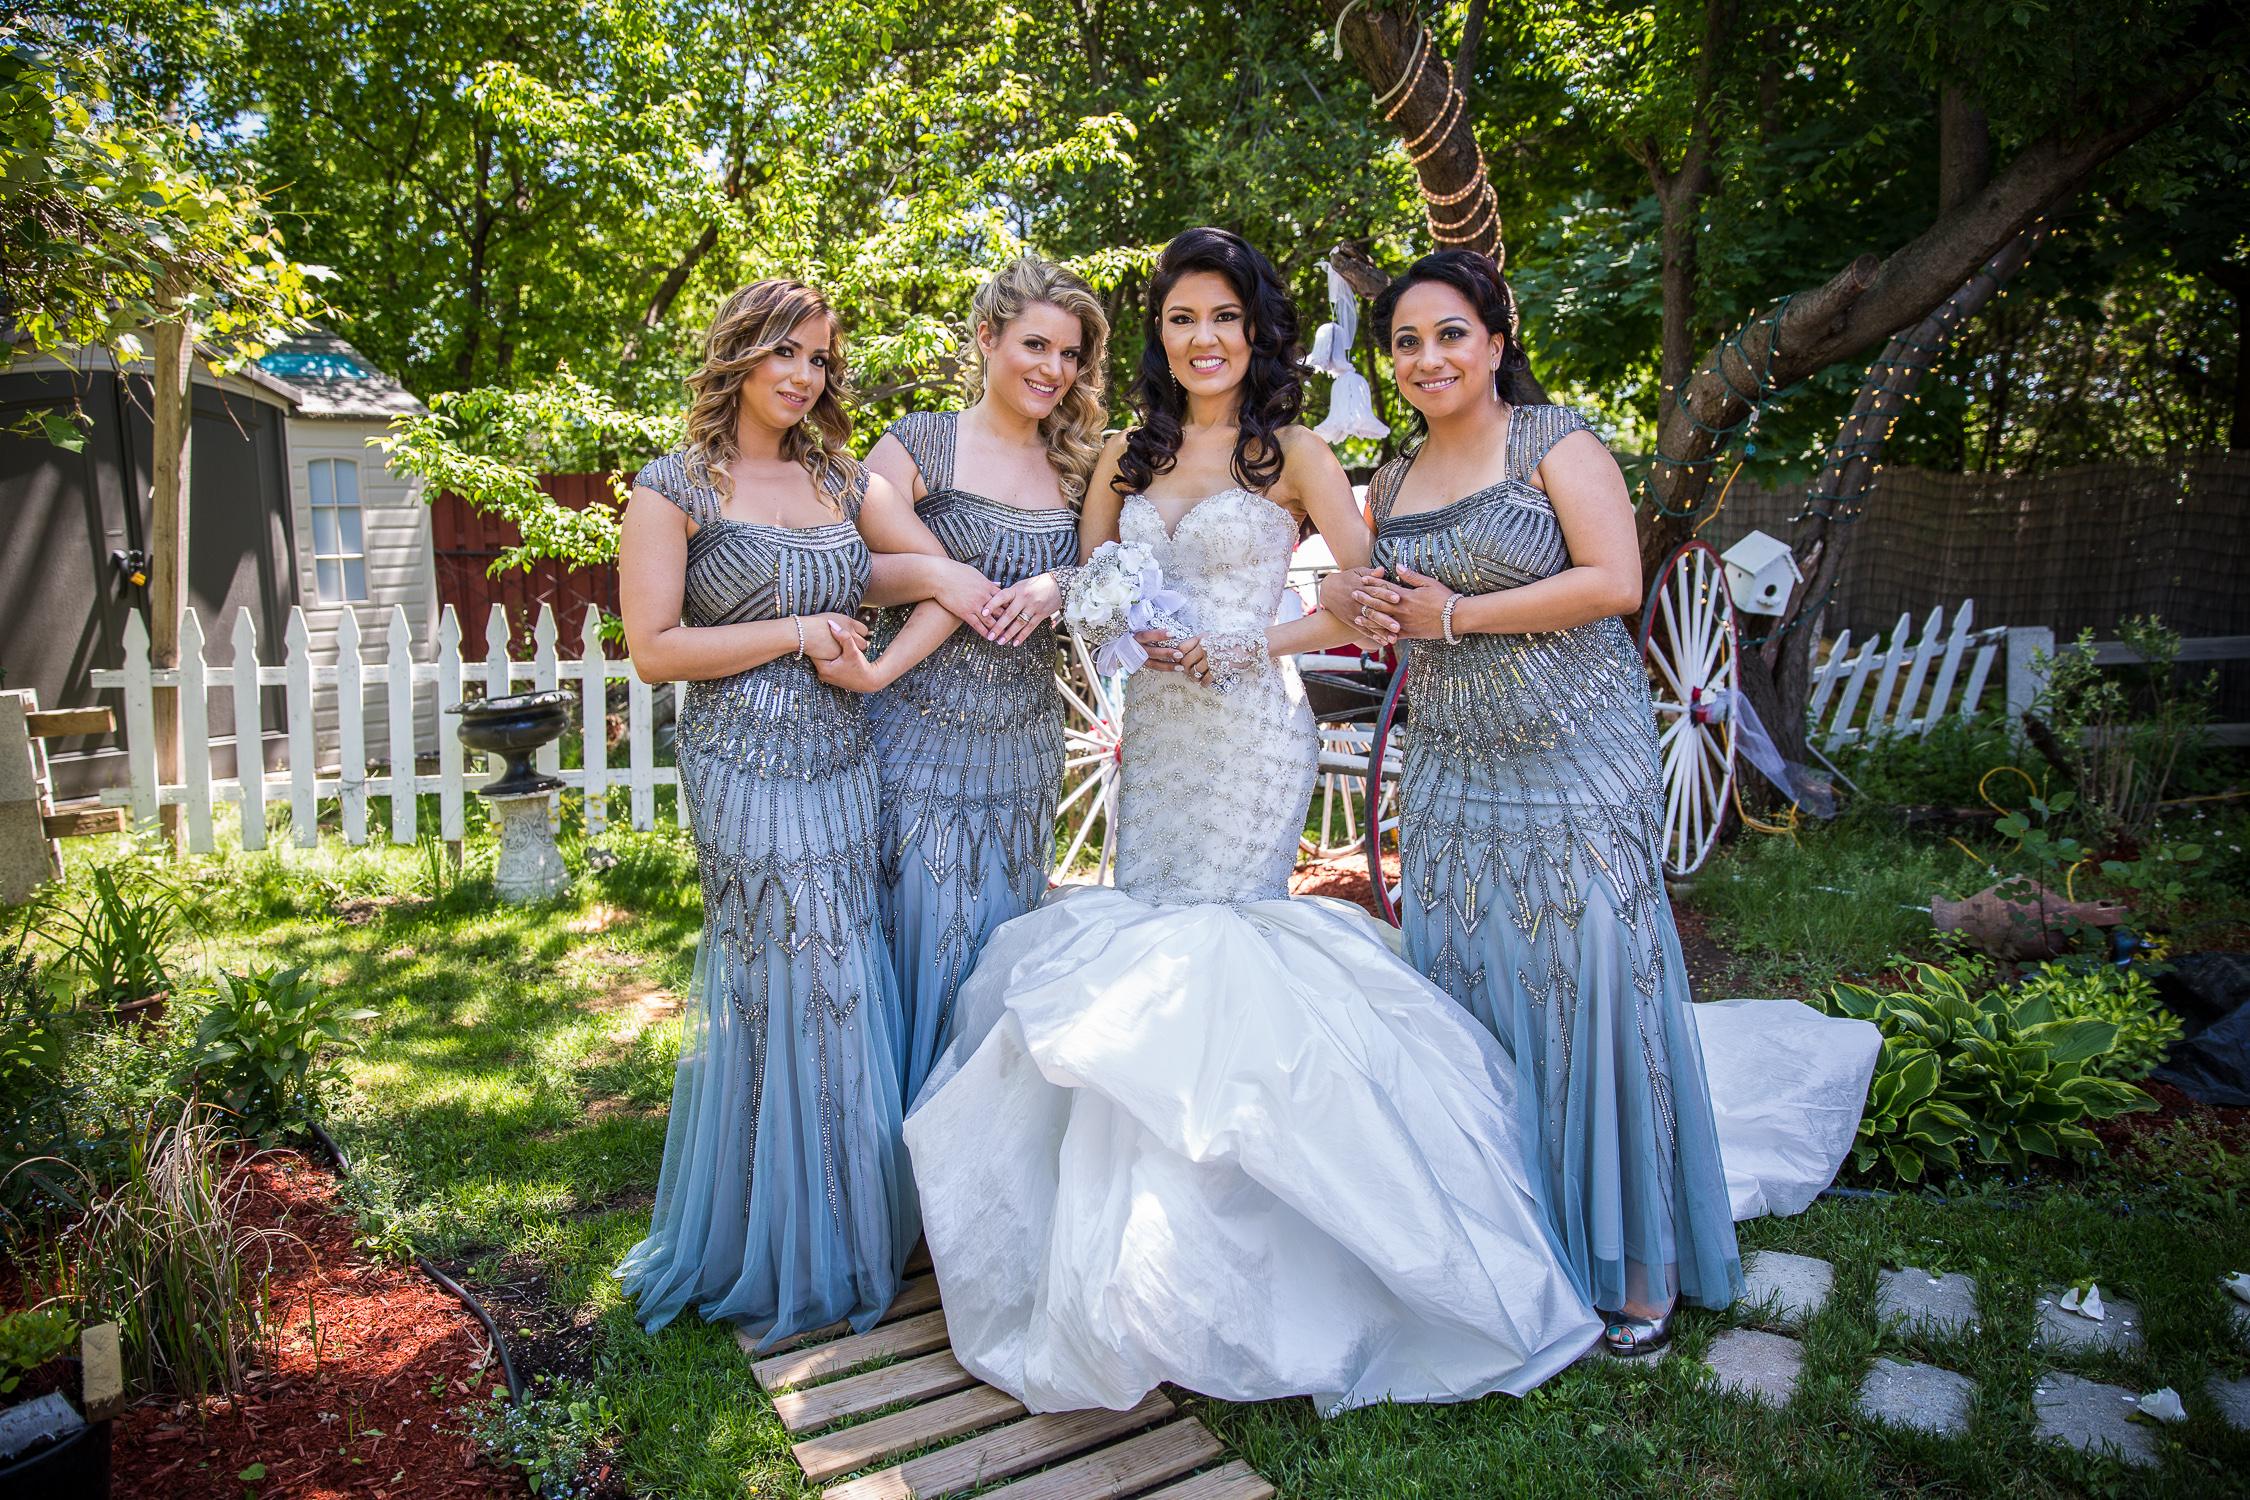 Paradise-Banquet-Hall-Wedding-Vaughan-Ontario-0025.jpg